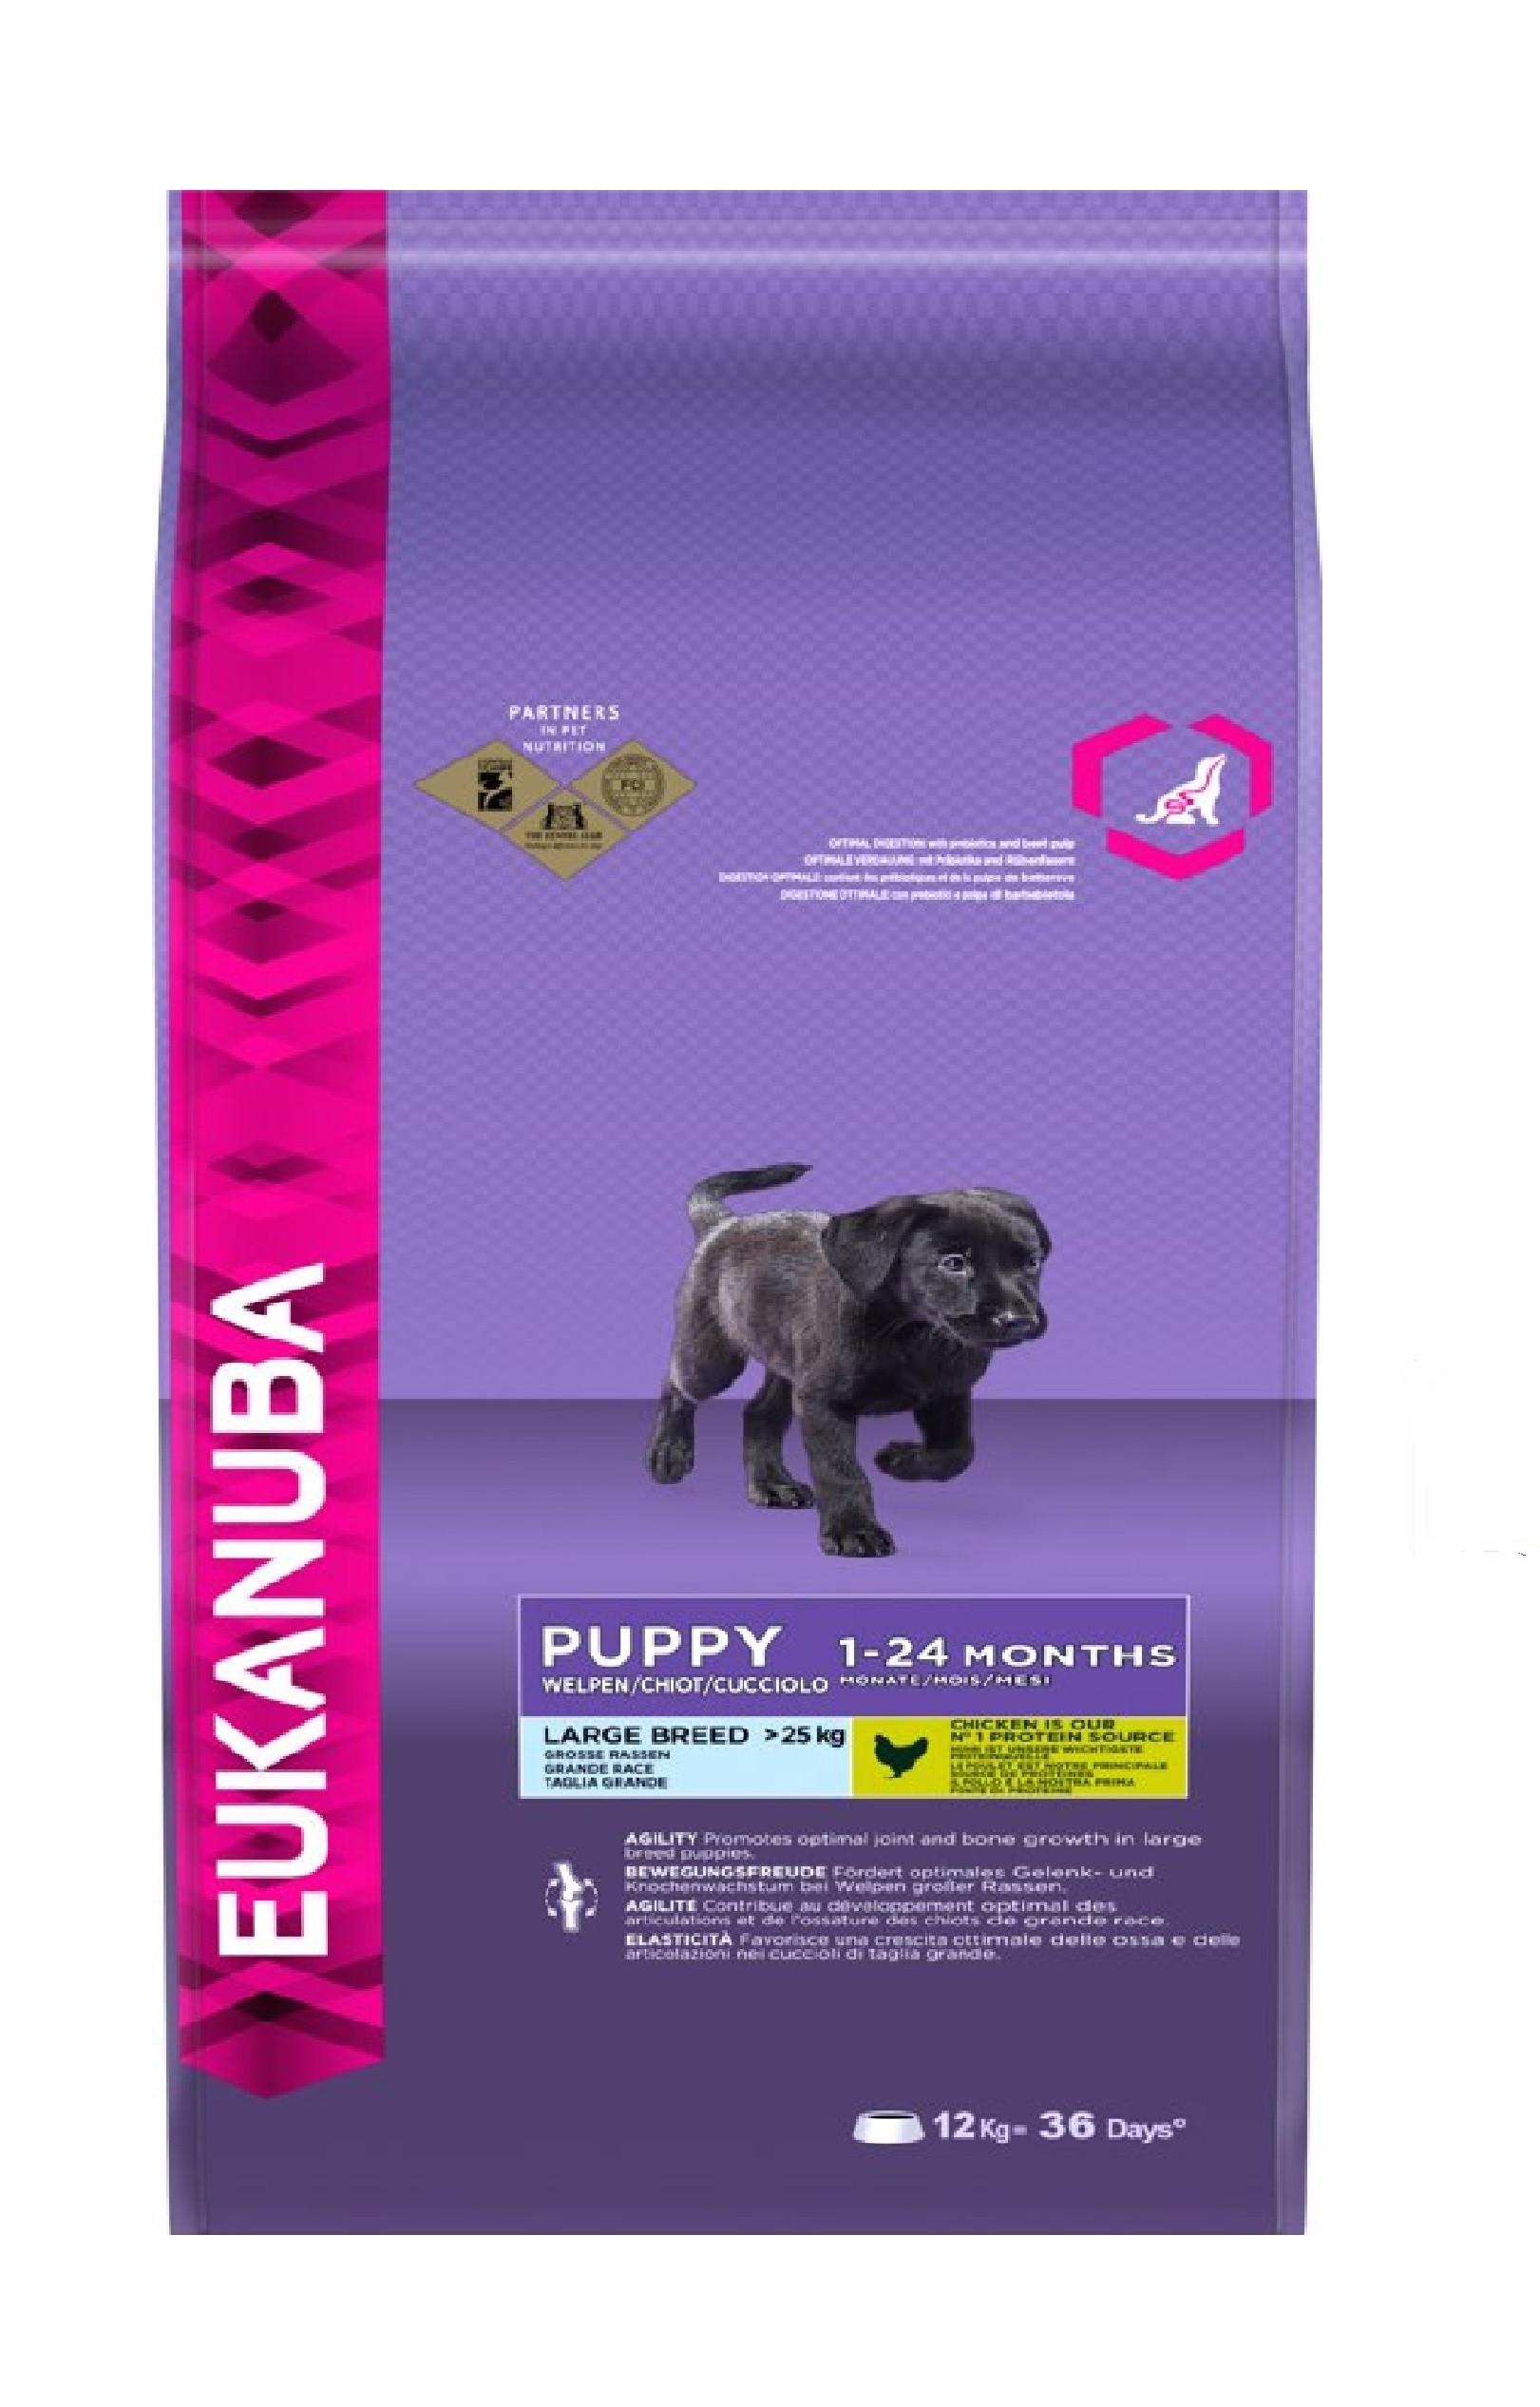 Eukanuba Puppy Large Breed hondenvoer